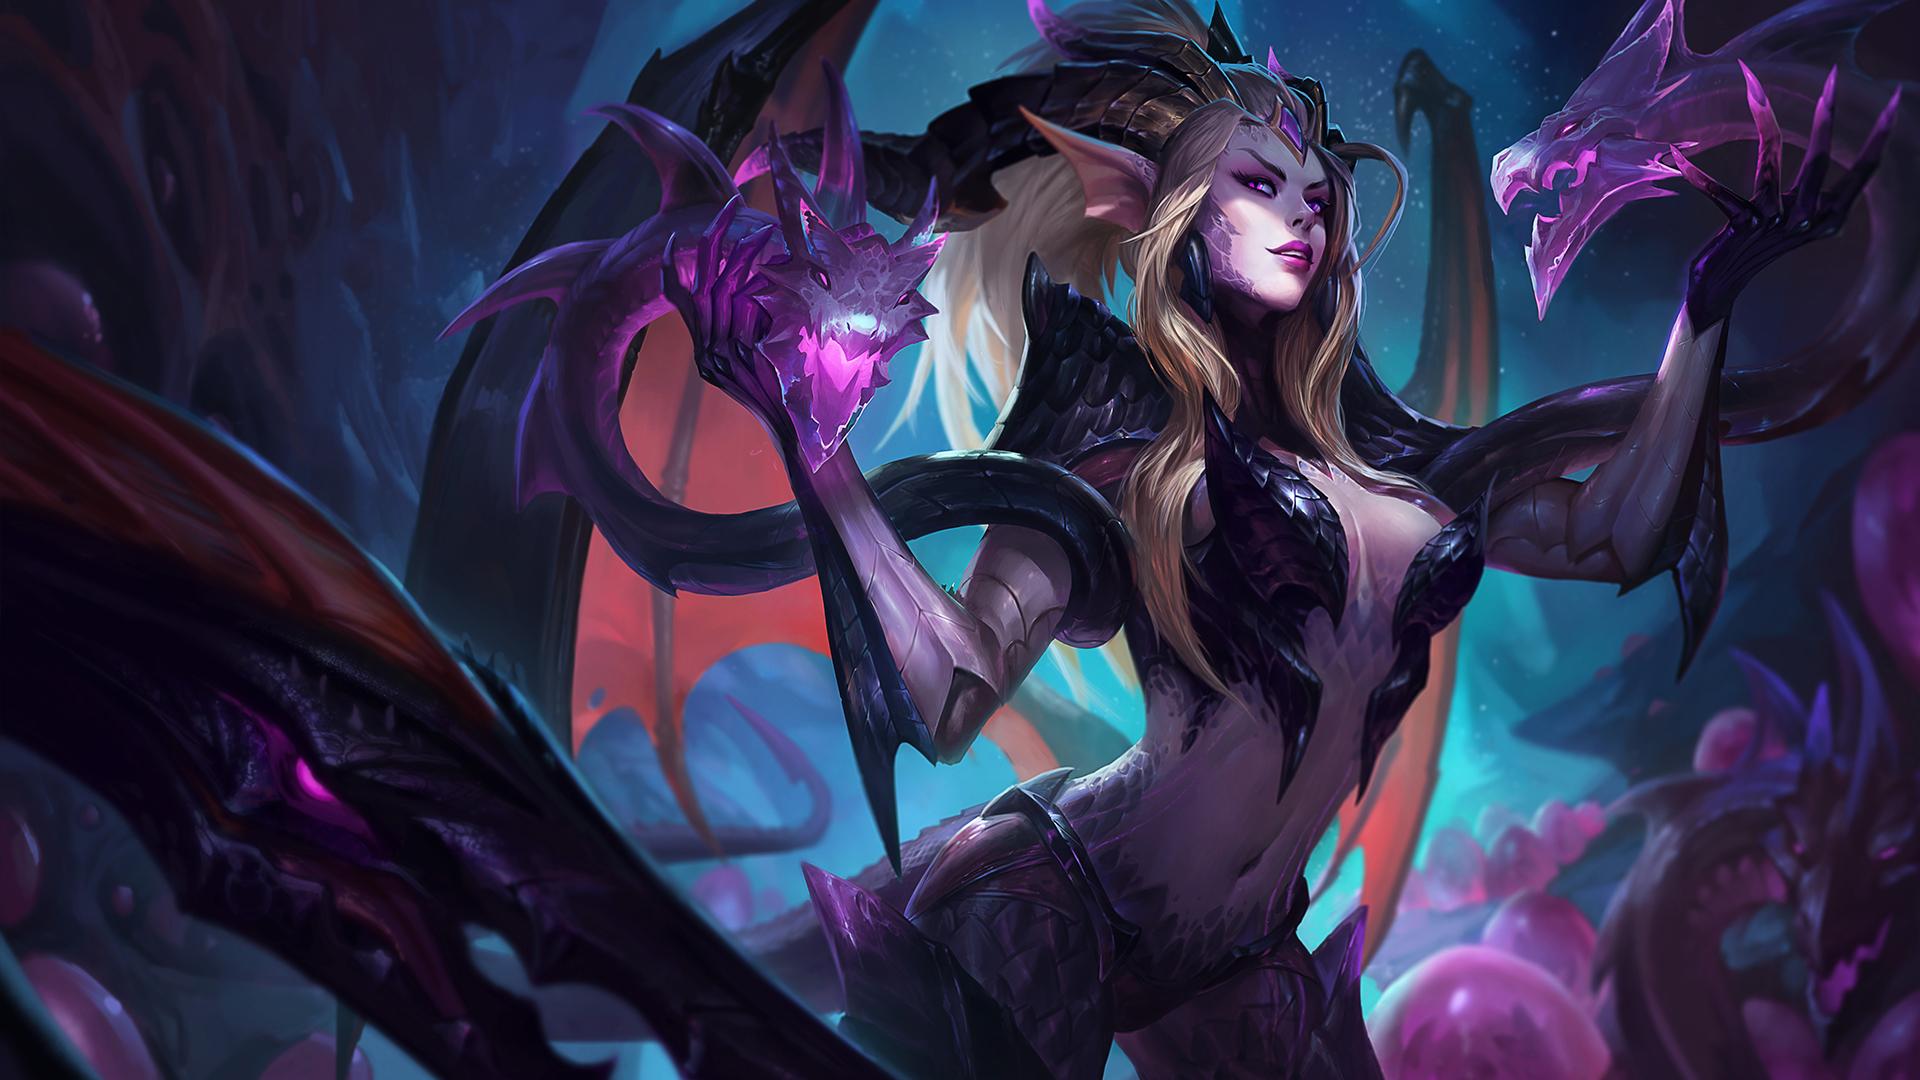 Dragon Sorceress Zyra splash art for League of Legends